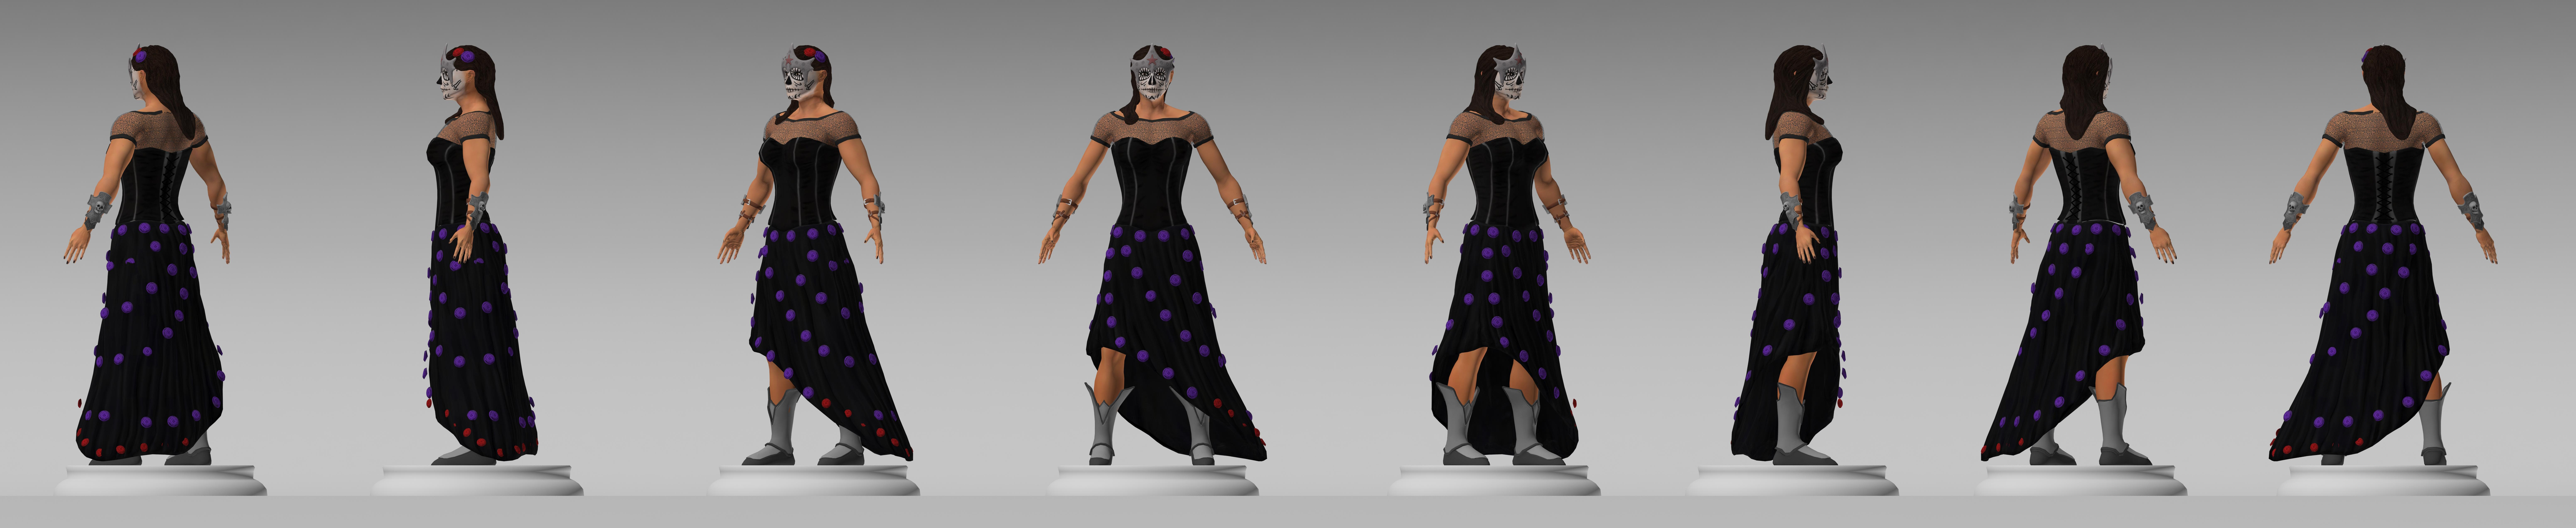 Wonder Woman001.jpg